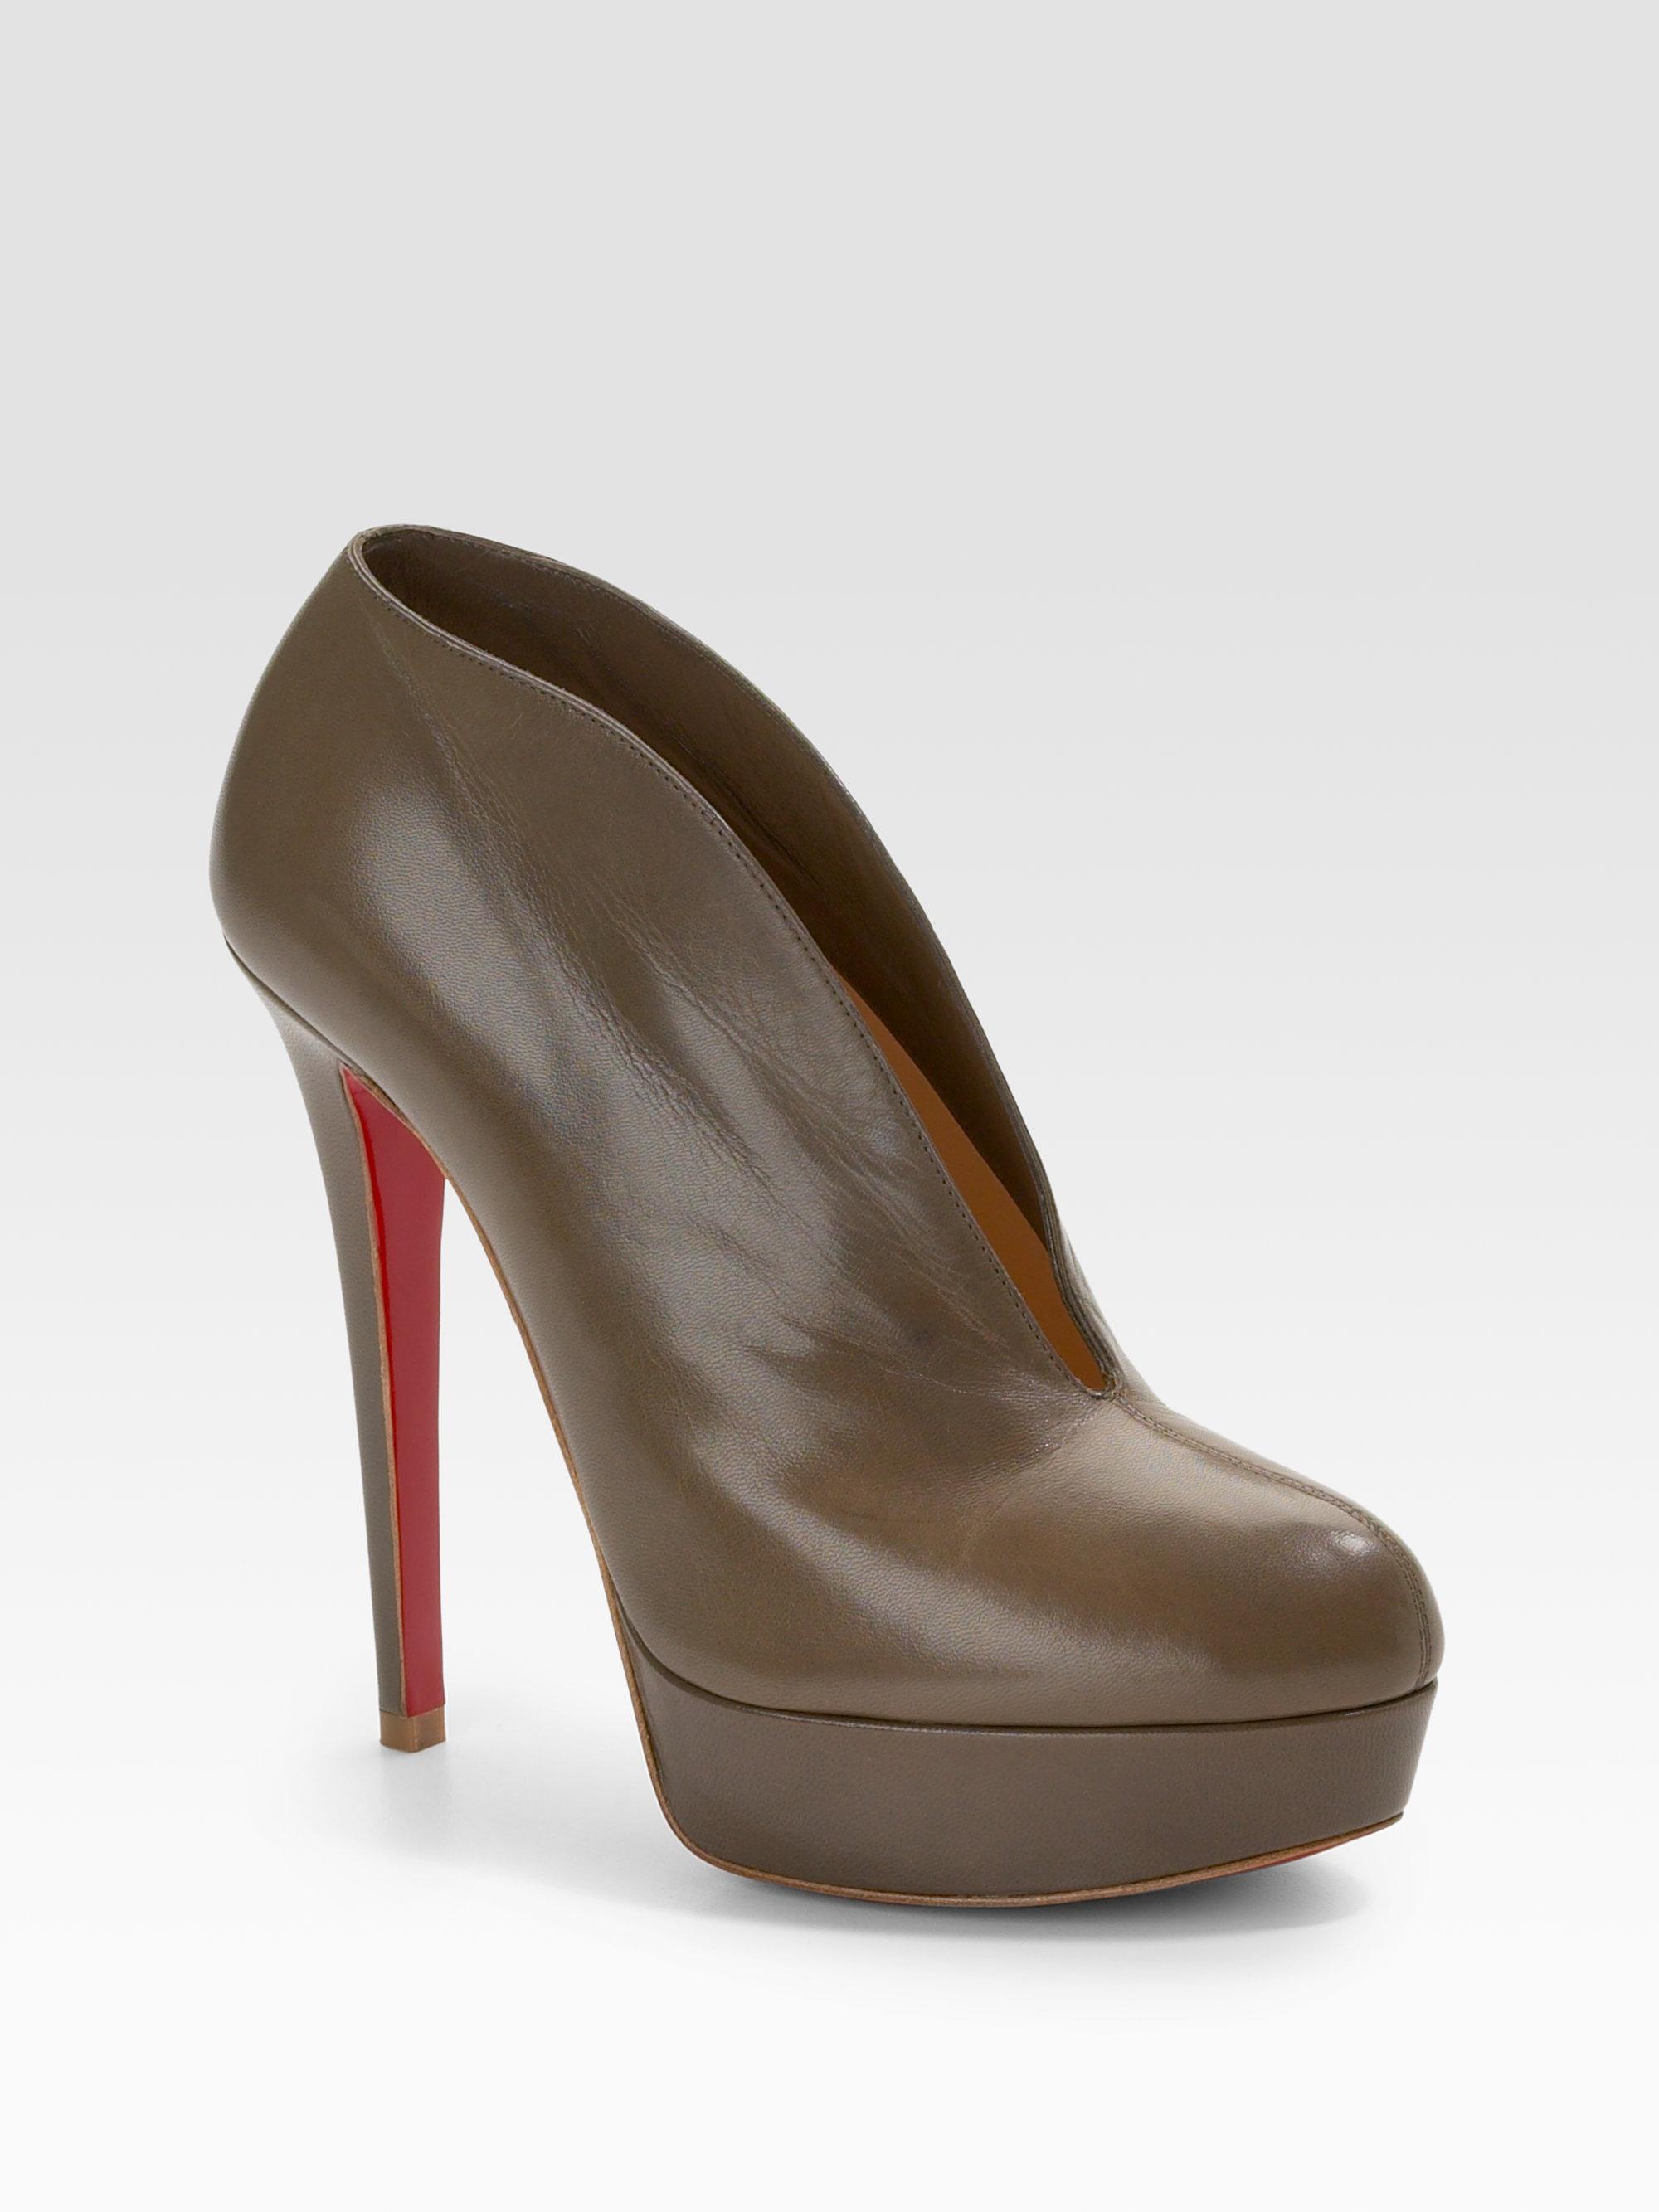 christian louboutin round-toe booties Metallic leather | cosmetics ...